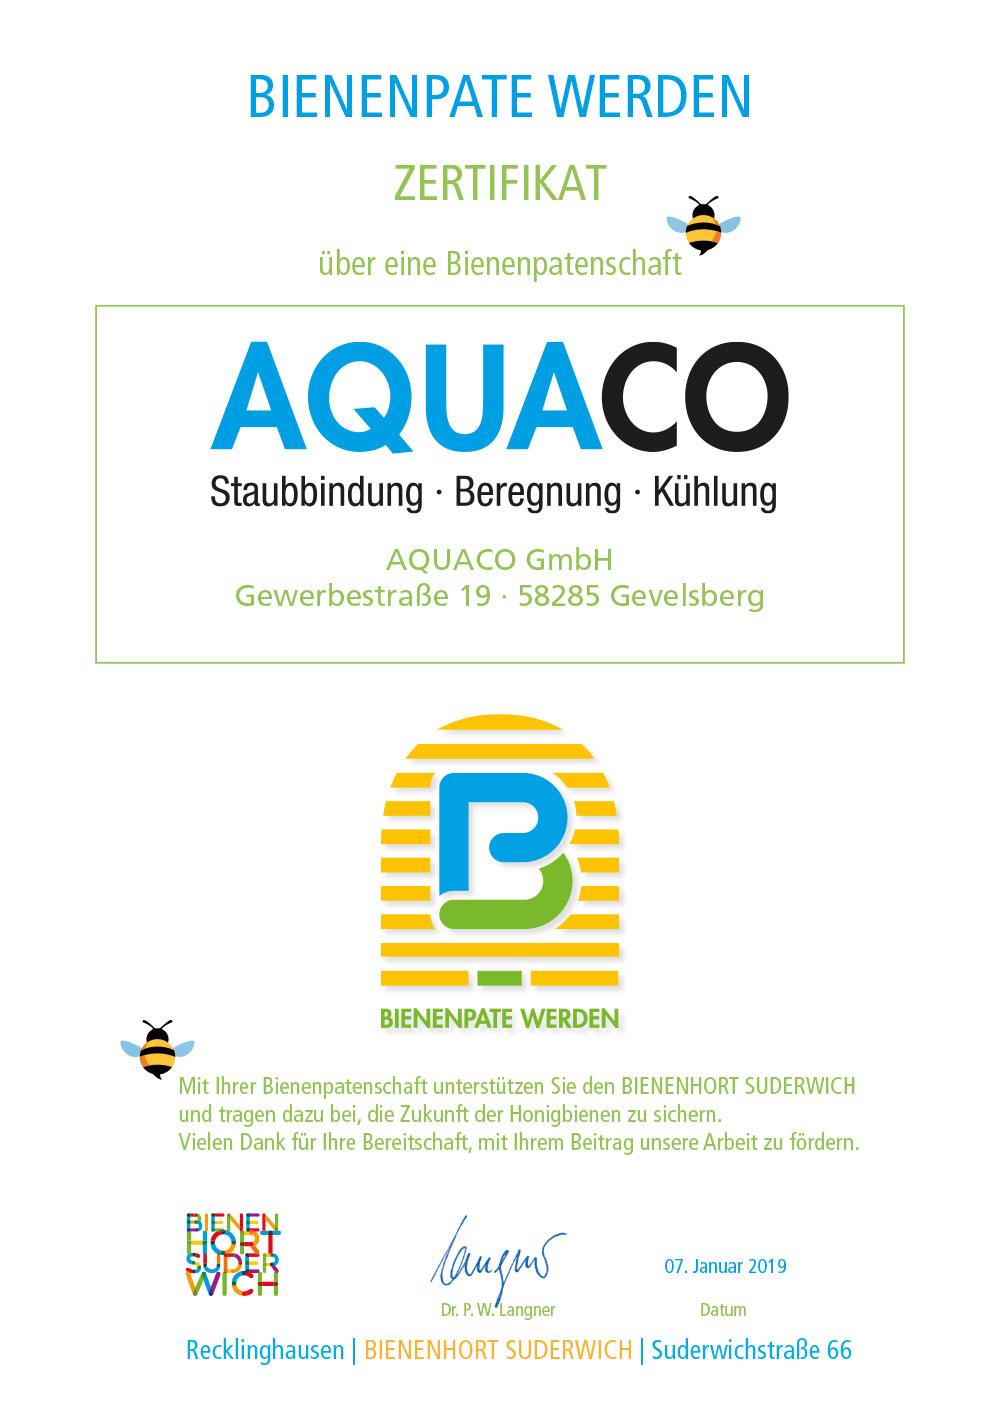 AQUACO Zertifikat BIENENPATE WERDEN des BIENENHORT SUDERWICH